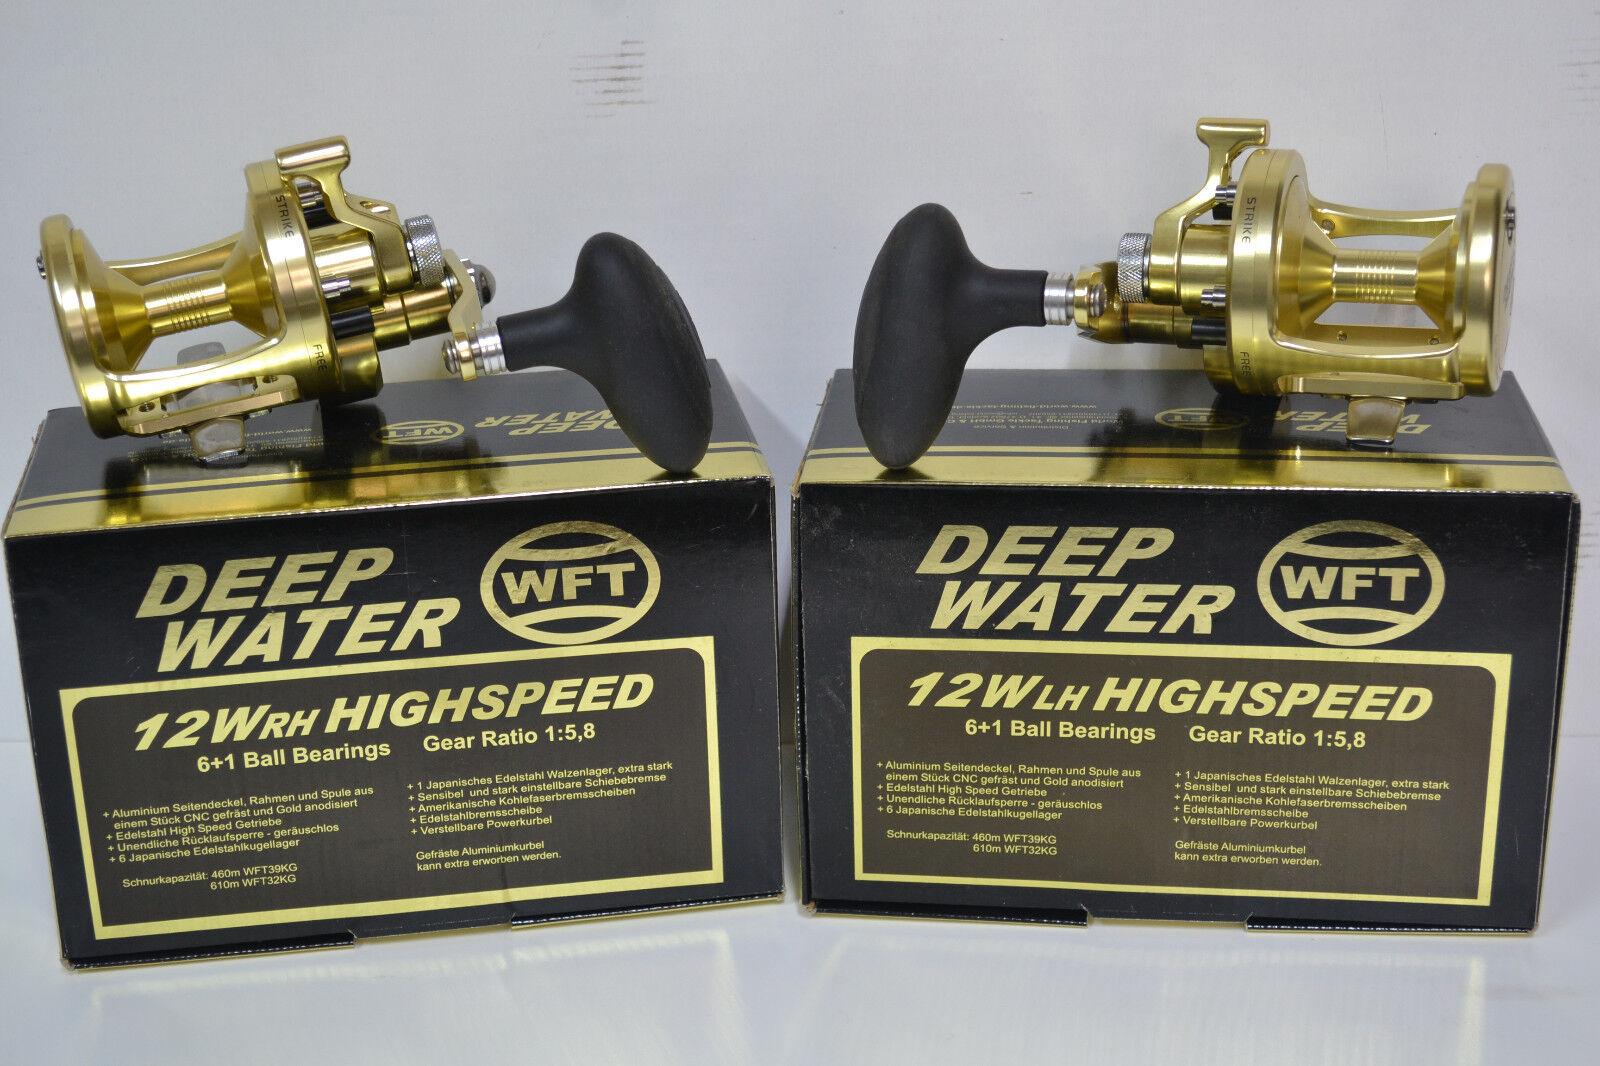 WFT Deep Water 12W High Speed Rechtshand/Linkshand Model Multirolle Angelrolle